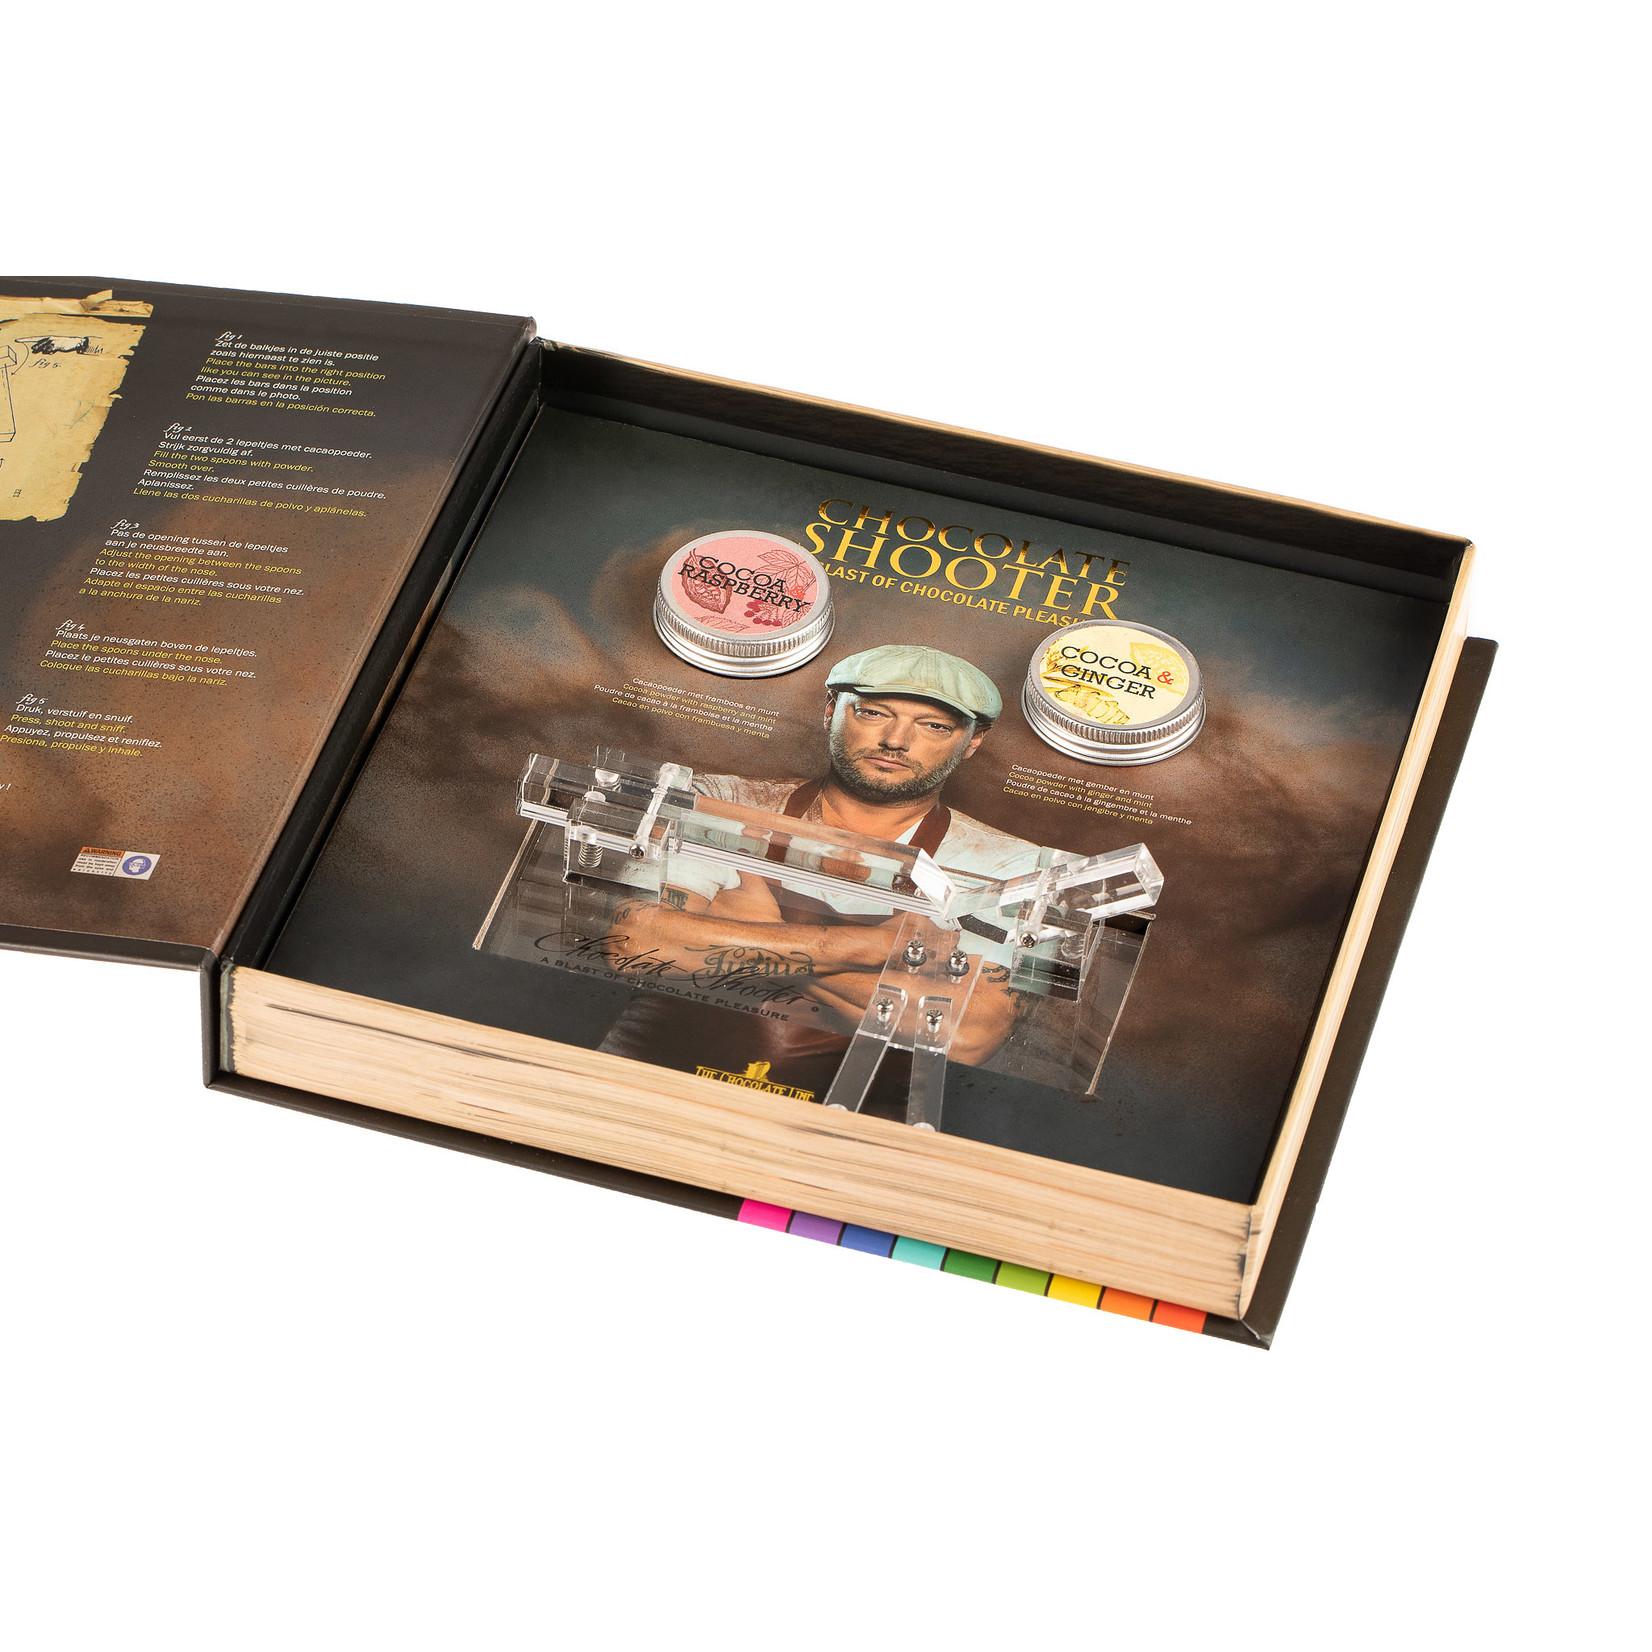 The Chocolate Line Chocolate Shooter